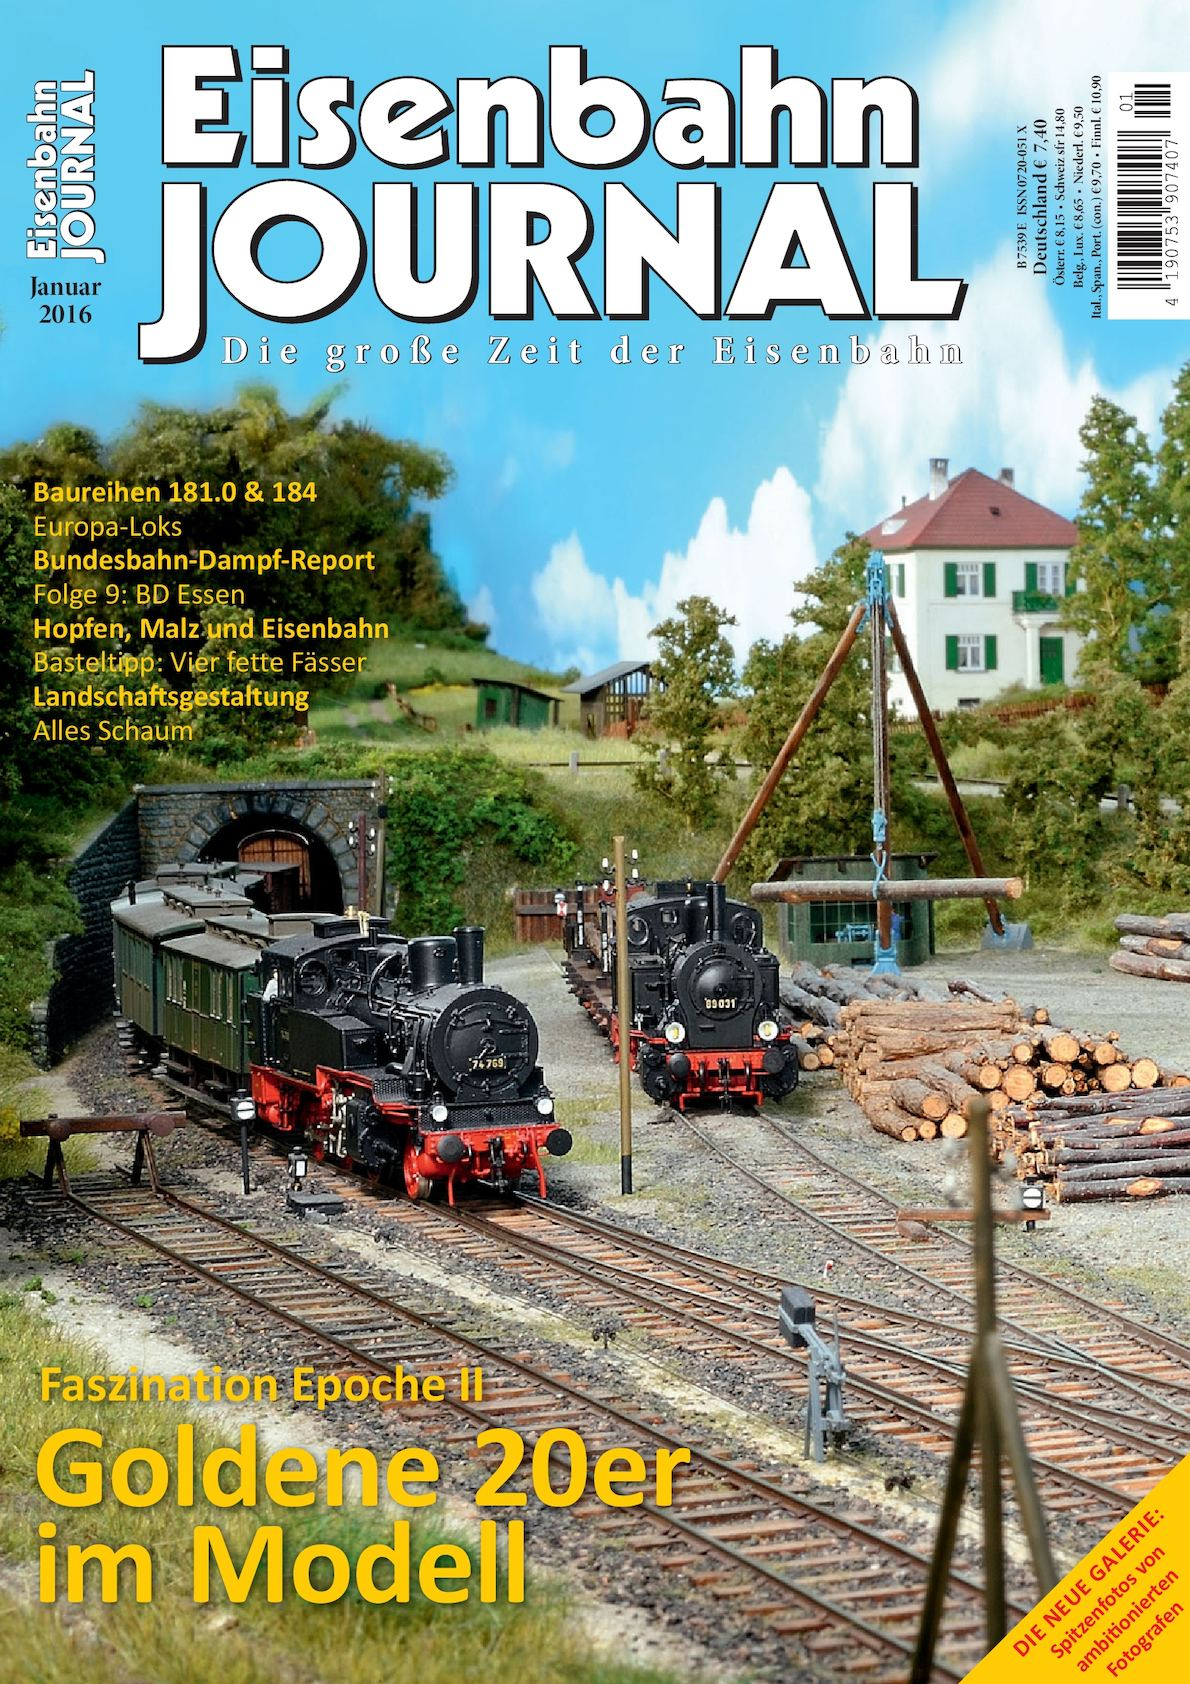 Calaméo - Eisenbahn Journal 01 2016